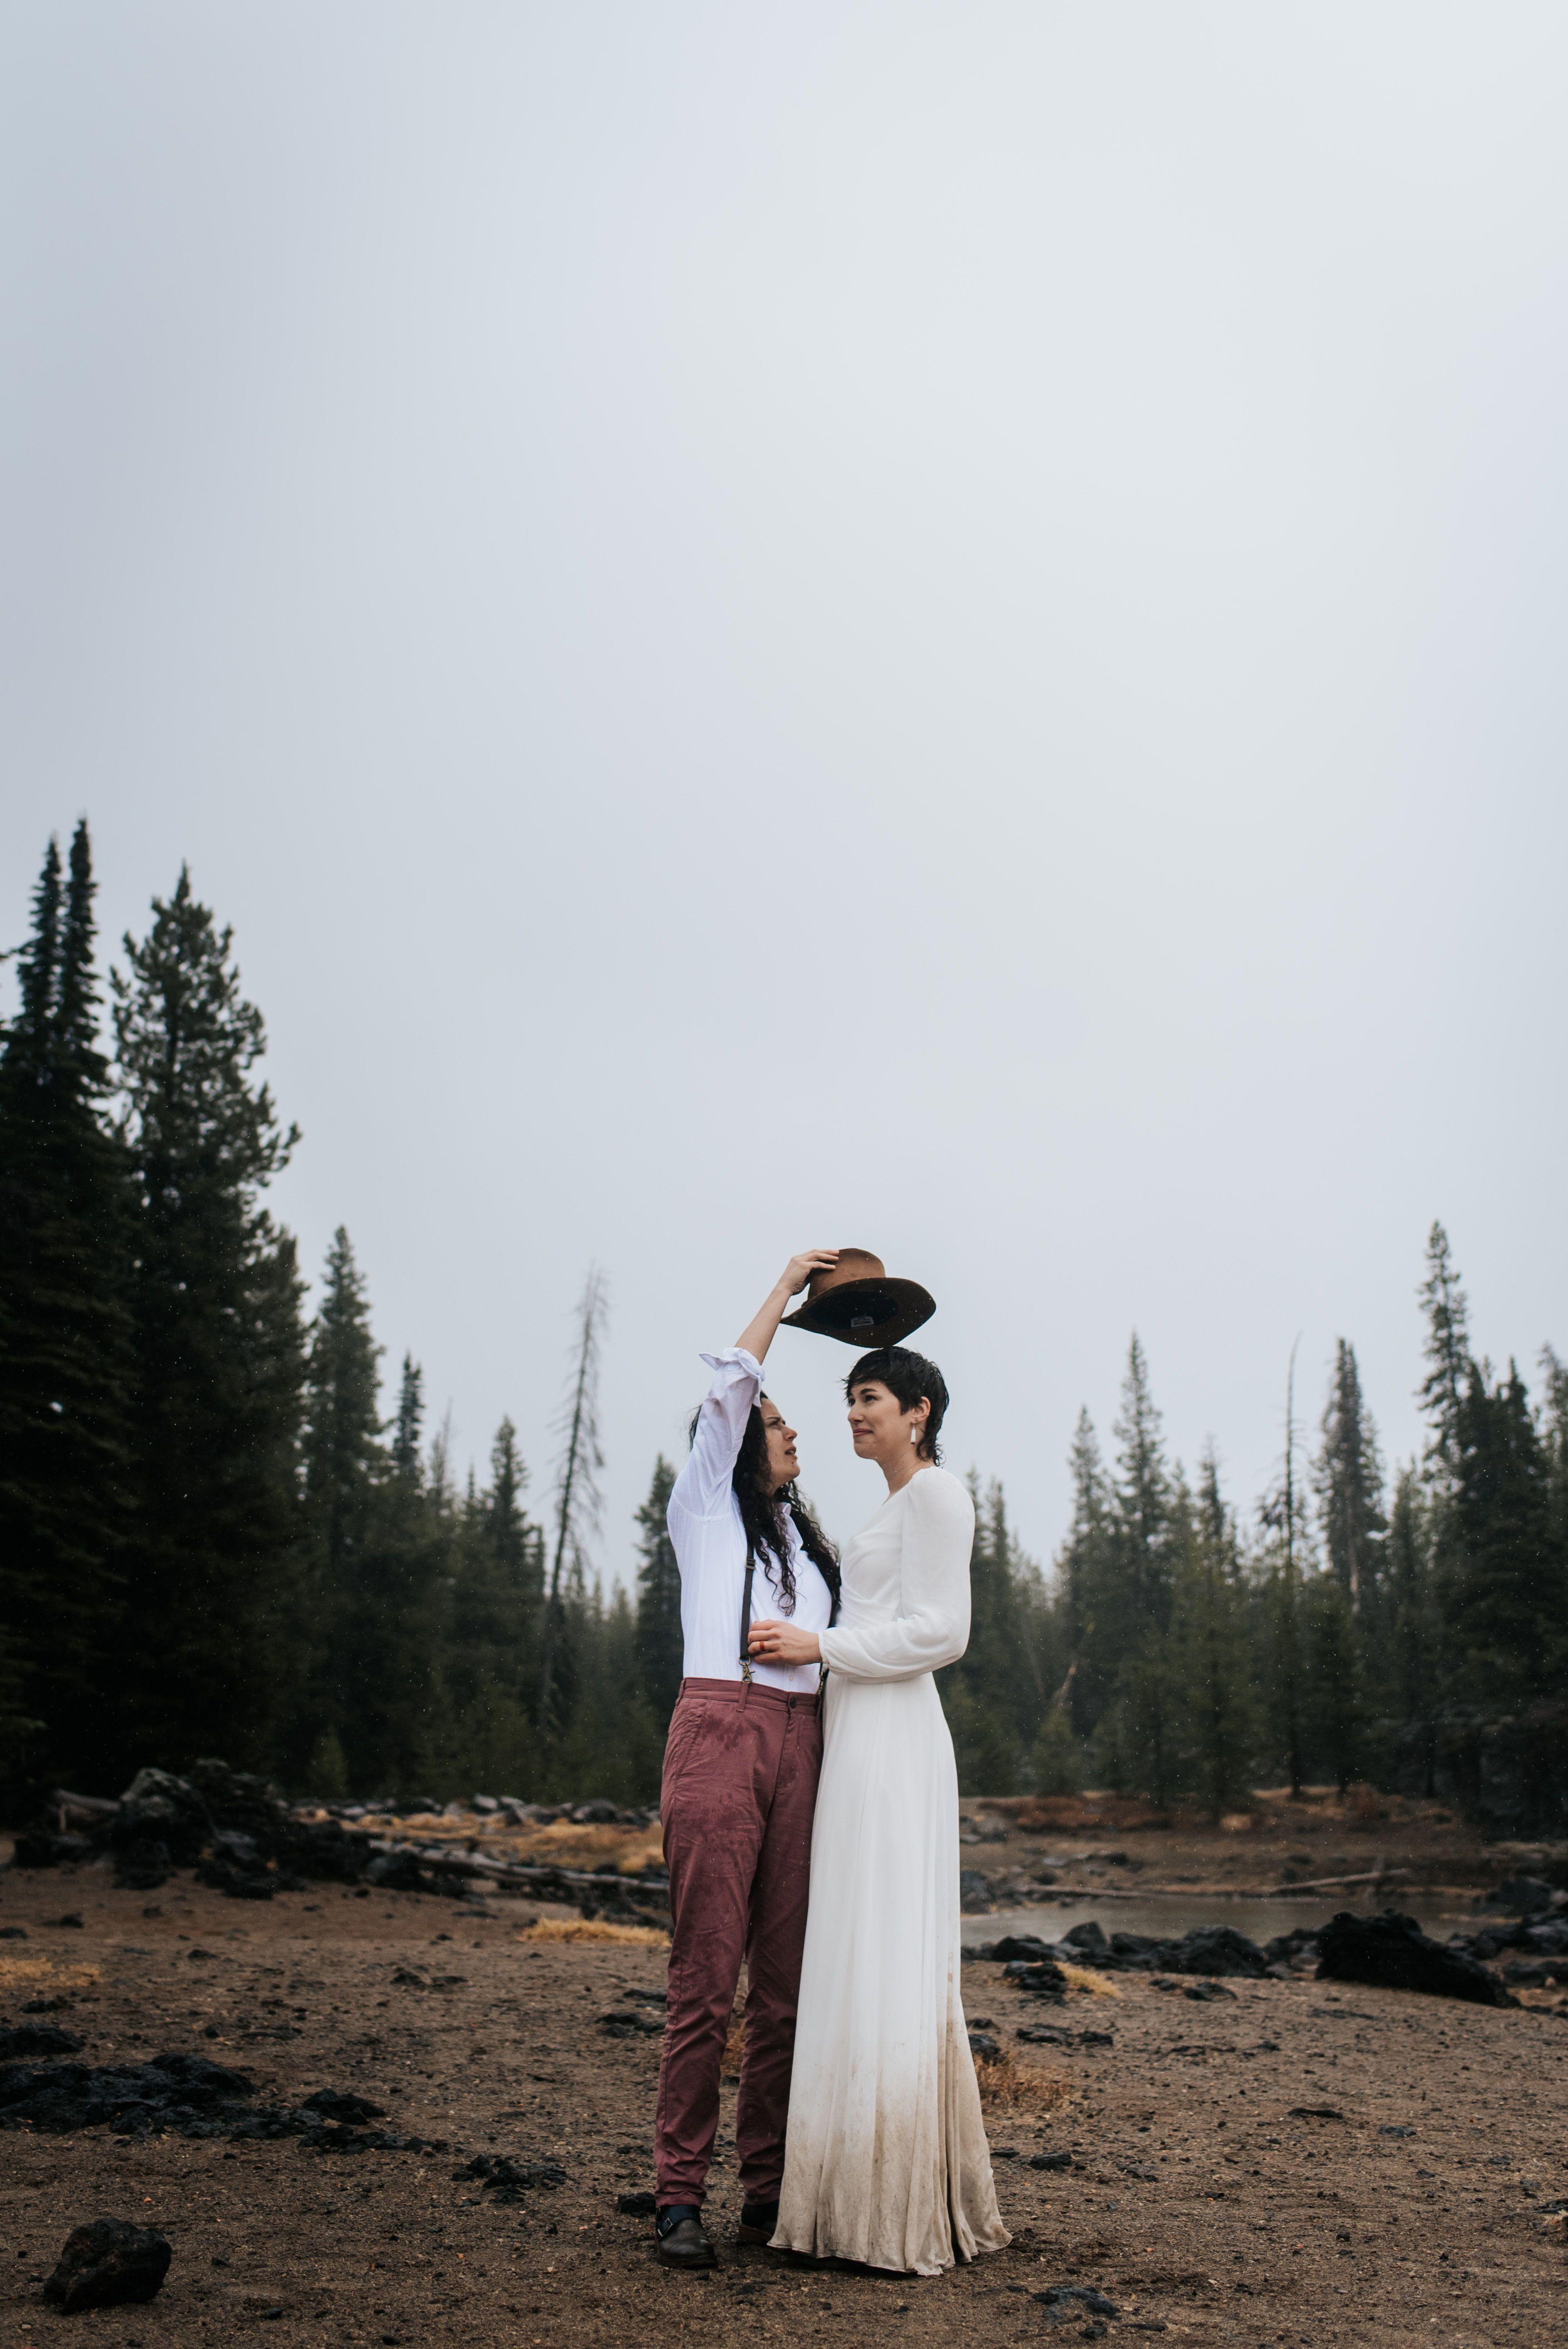 Redmond Elopement Photographer Now Booking 2019 And 2020 Weddings